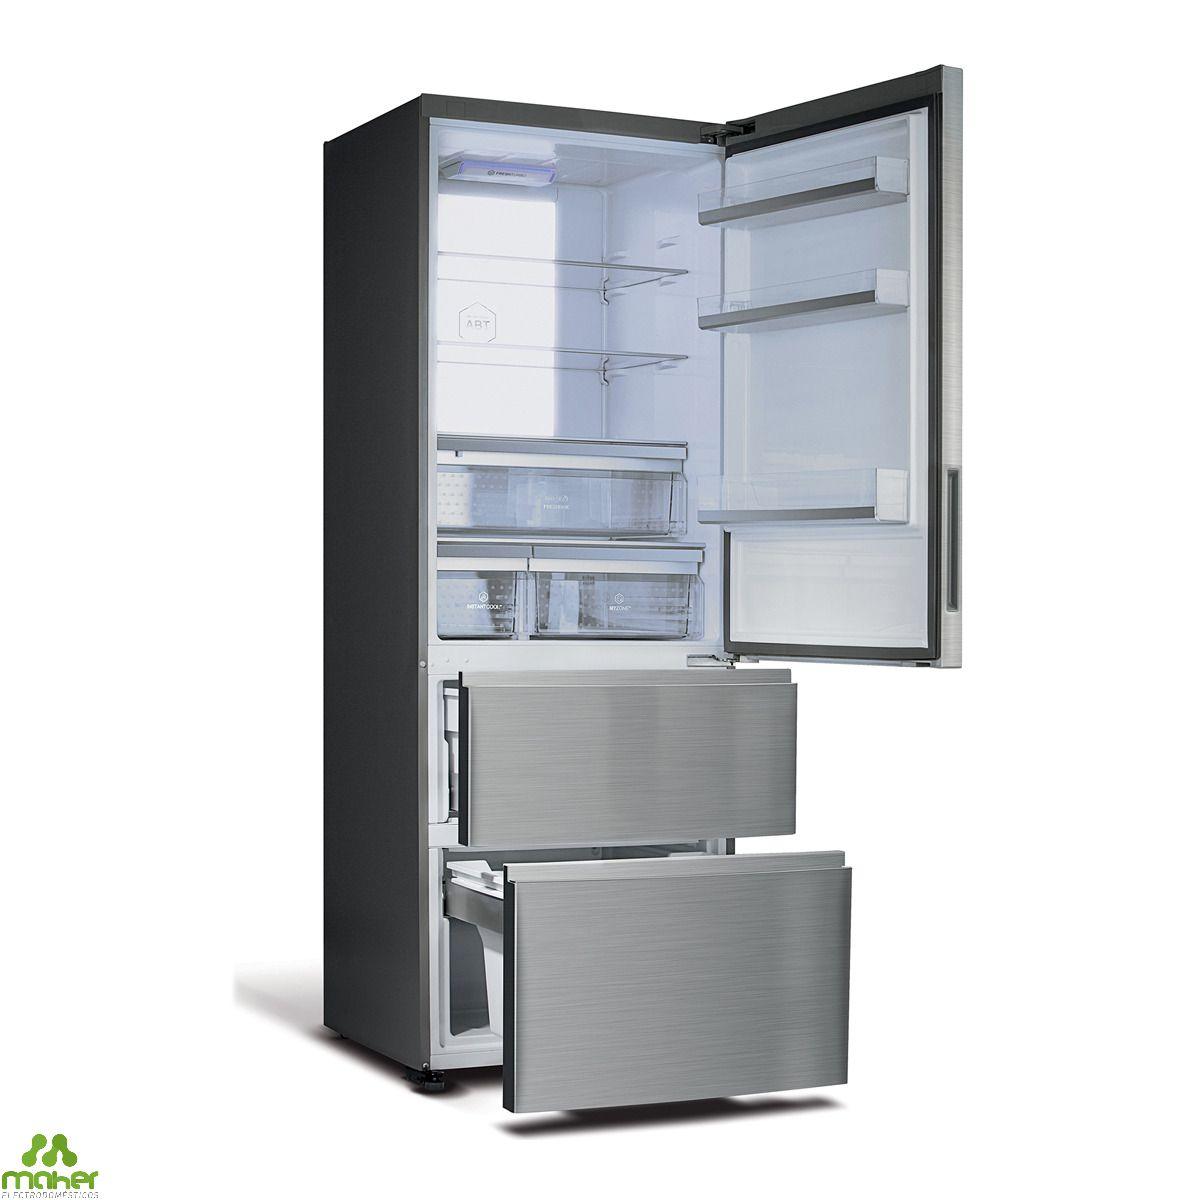 frigorifico combi ancho 70 haier a3fe742cmj. Black Bedroom Furniture Sets. Home Design Ideas